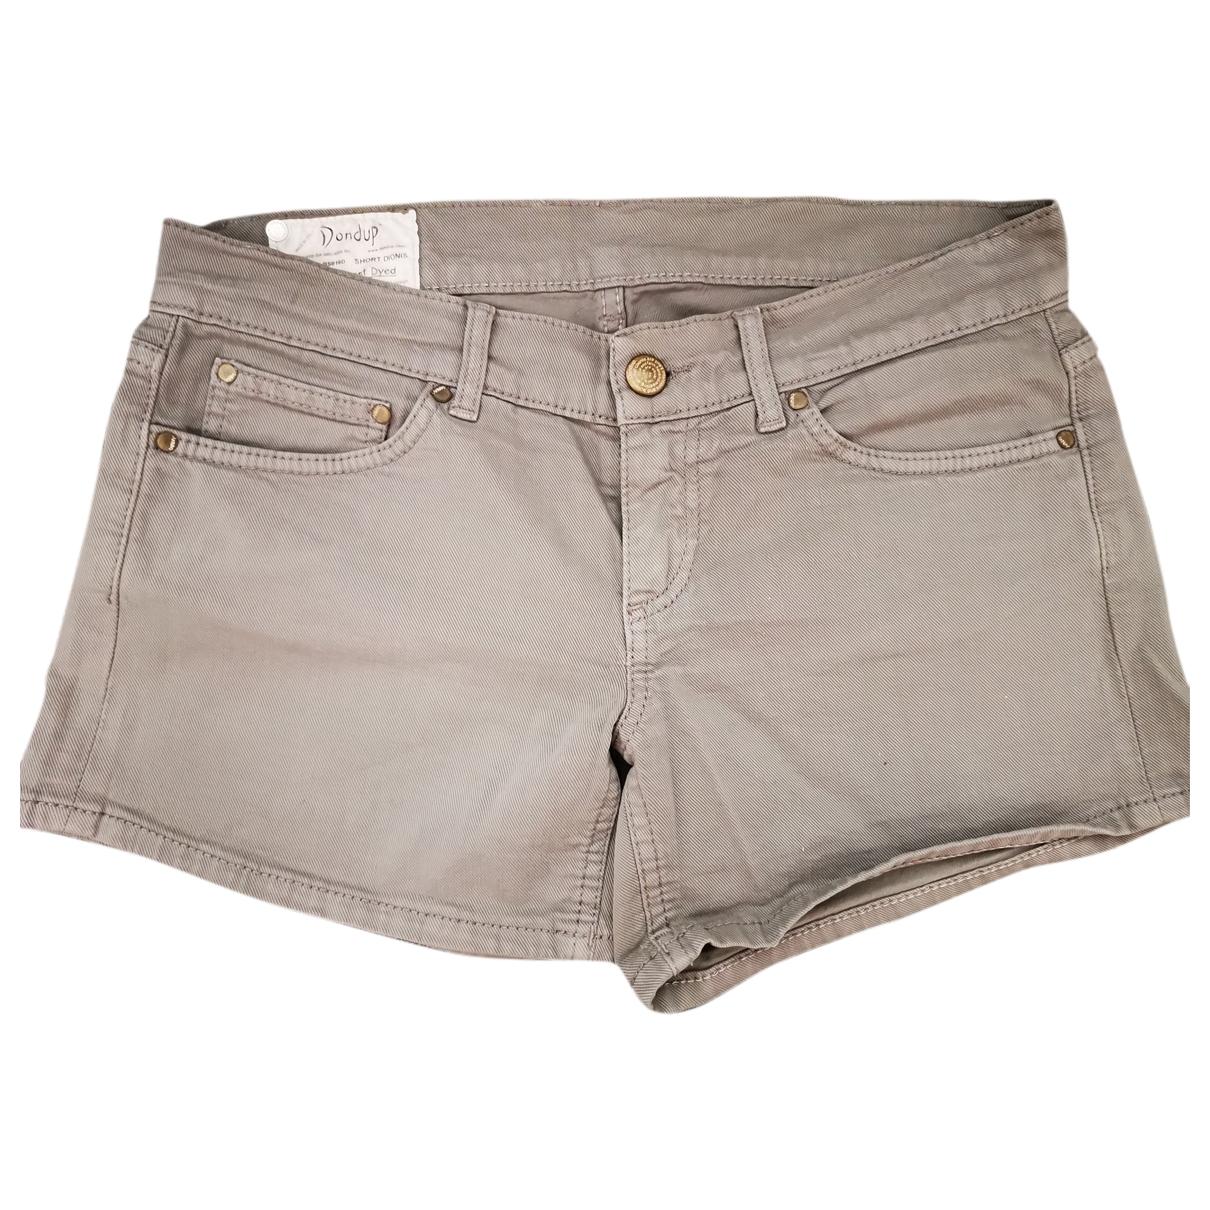 Dondup \N Shorts in  Grau Denim - Jeans